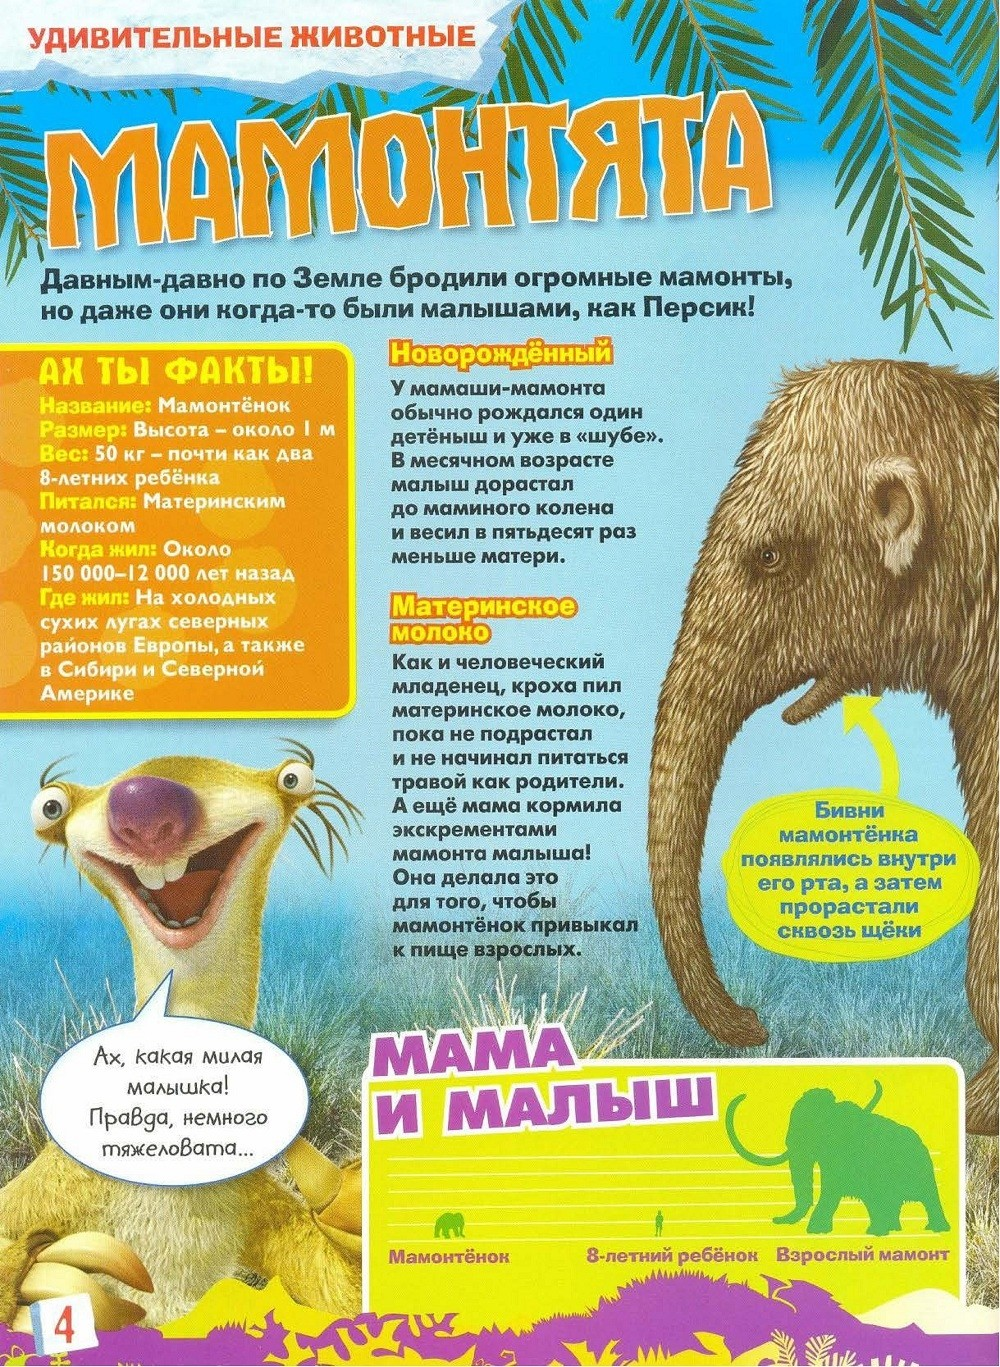 http://images.vfl.ru/ii/1392666935/29bc09a5/4274427.jpg